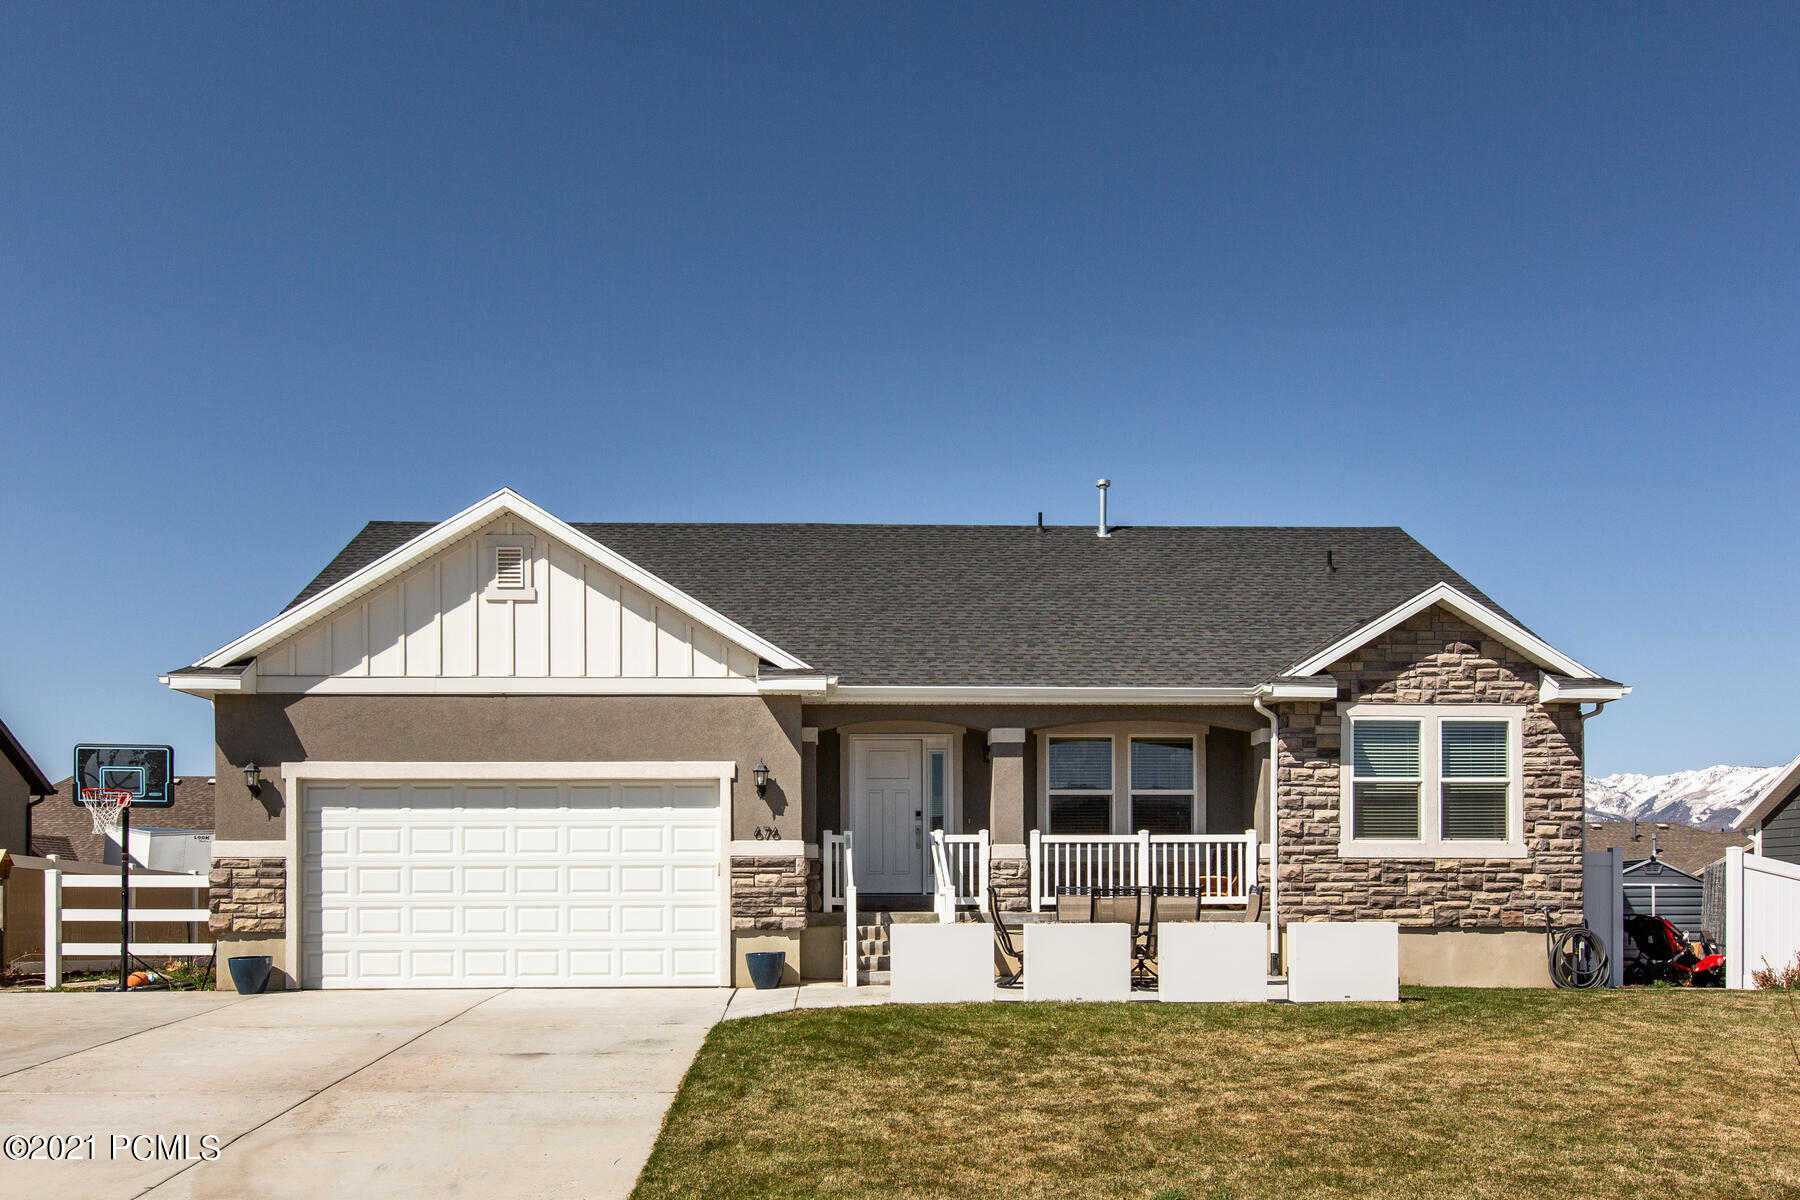 676 930 East, Heber City, Utah 84032, 5 Bedrooms Bedrooms, ,3 BathroomsBathrooms,Single Family,For Sale,930,12101350